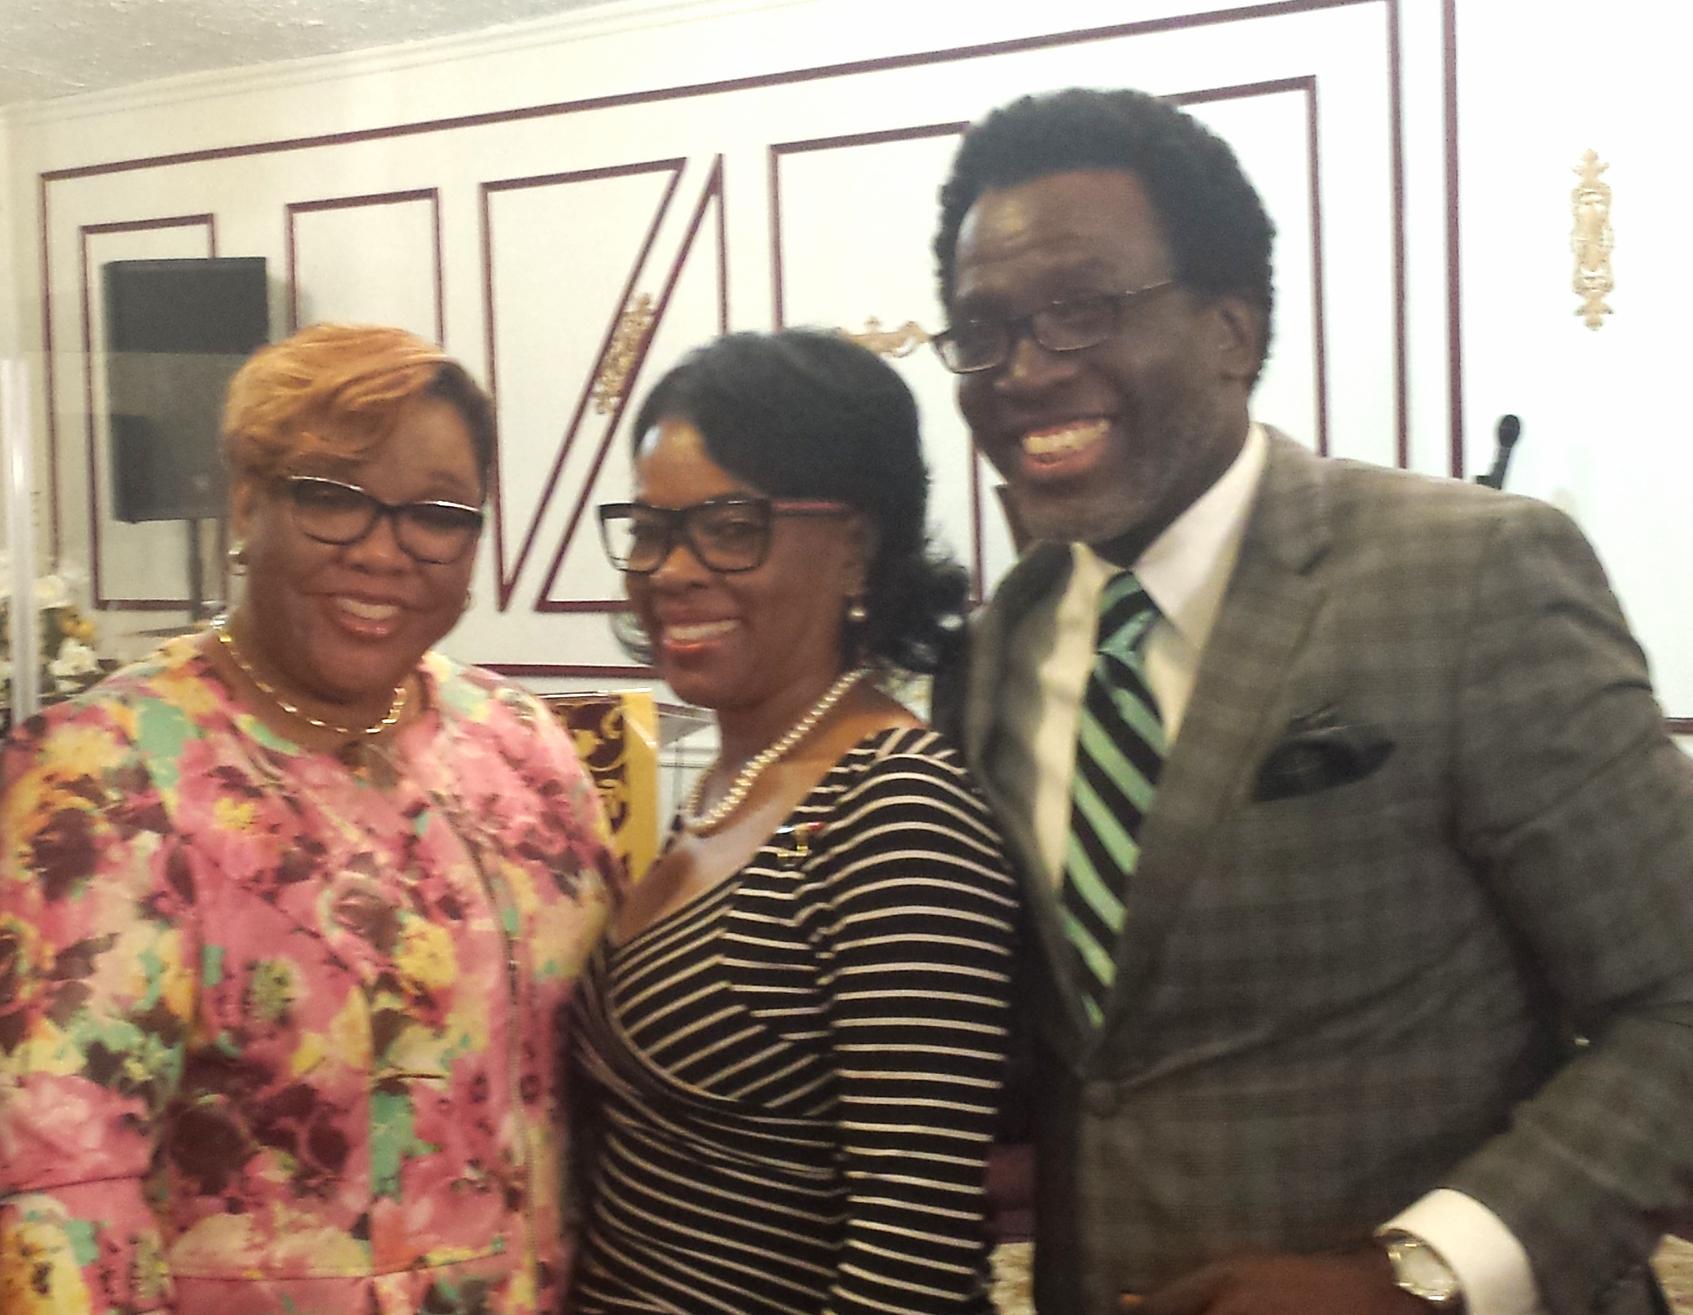 Left to Right:Pastor Robbin B. Hargrove, Apostle Kim A. Davis & Chief Apostle Eugene Smith